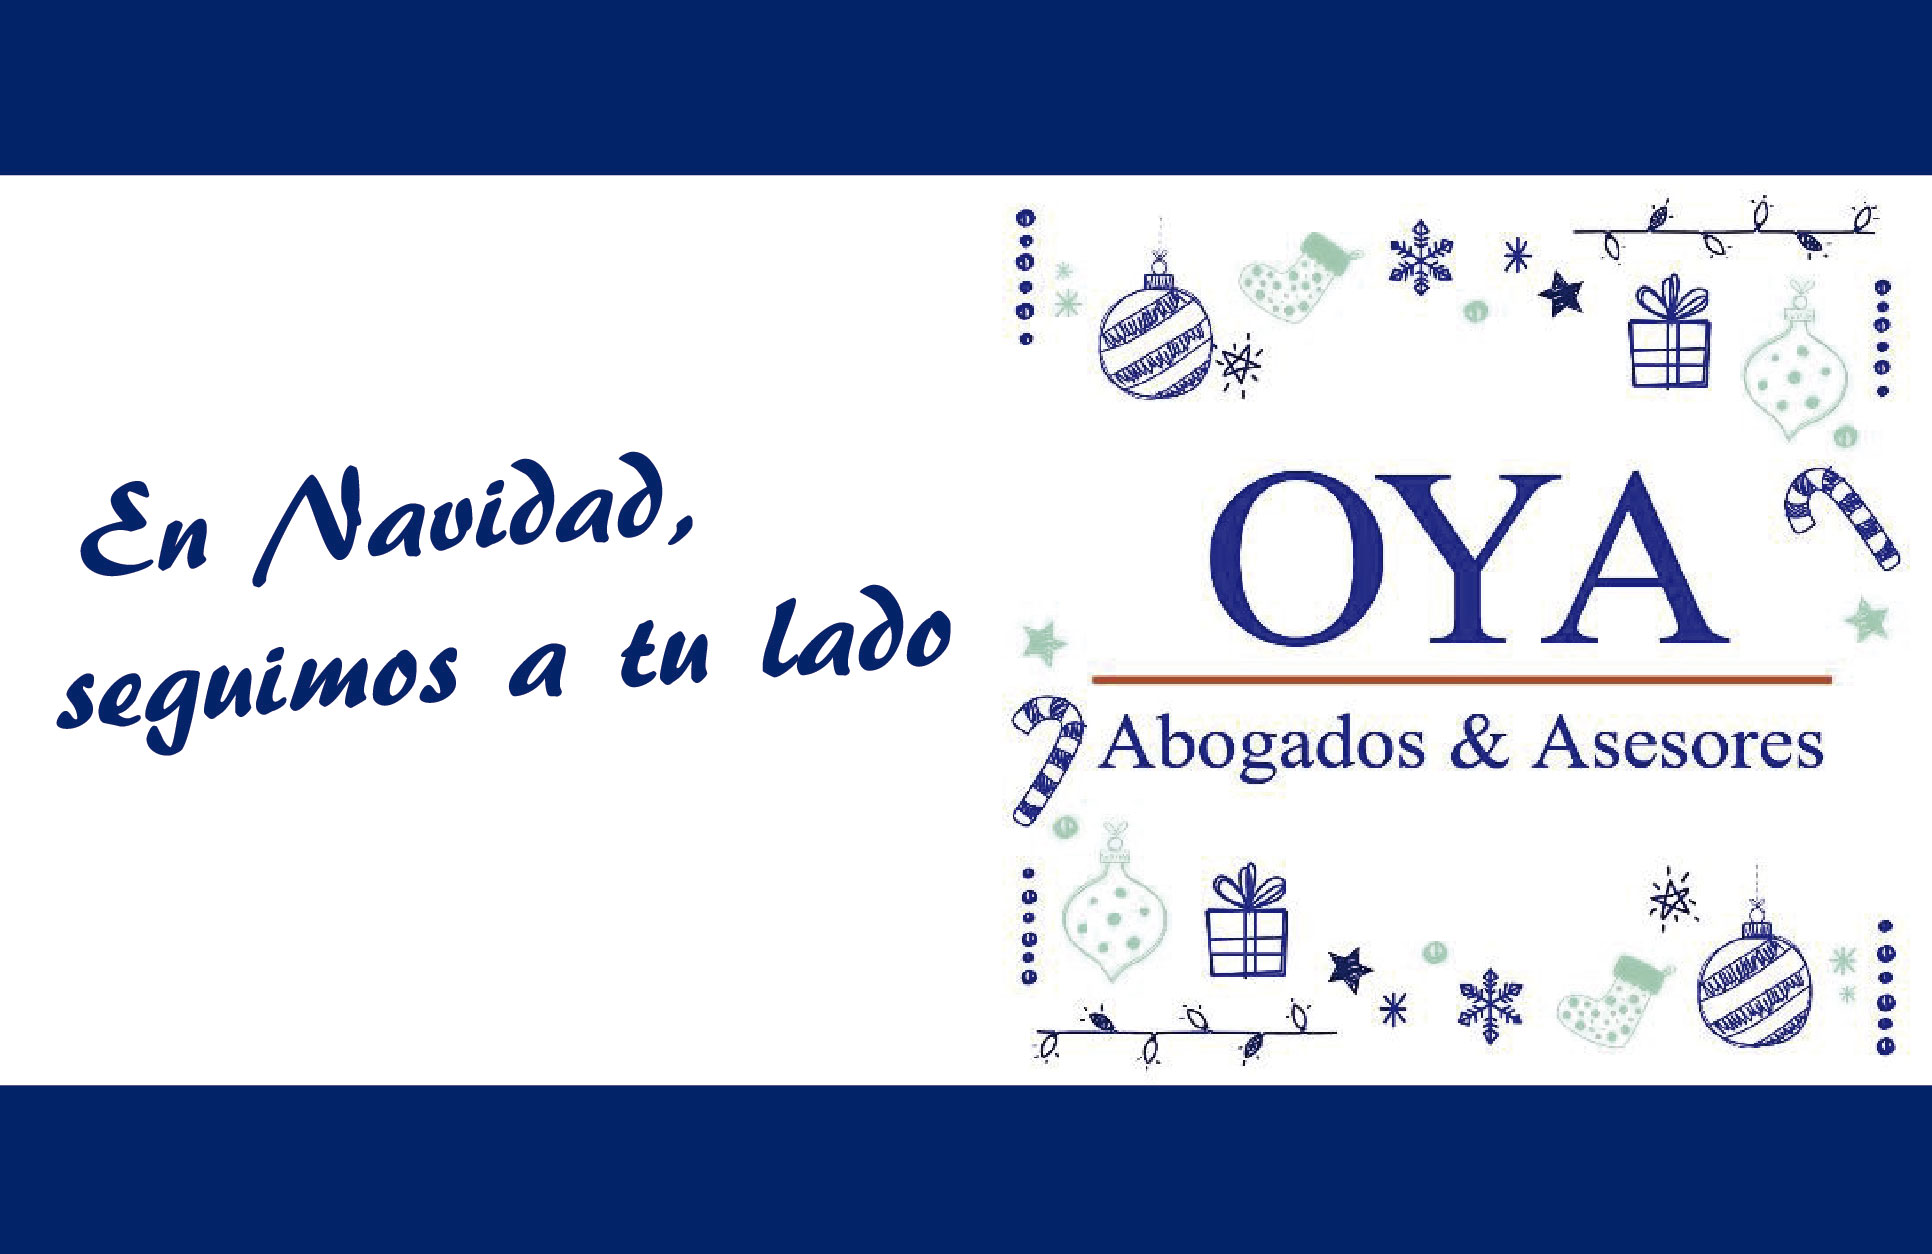 navidad-oya-abogados-&-asesores-01